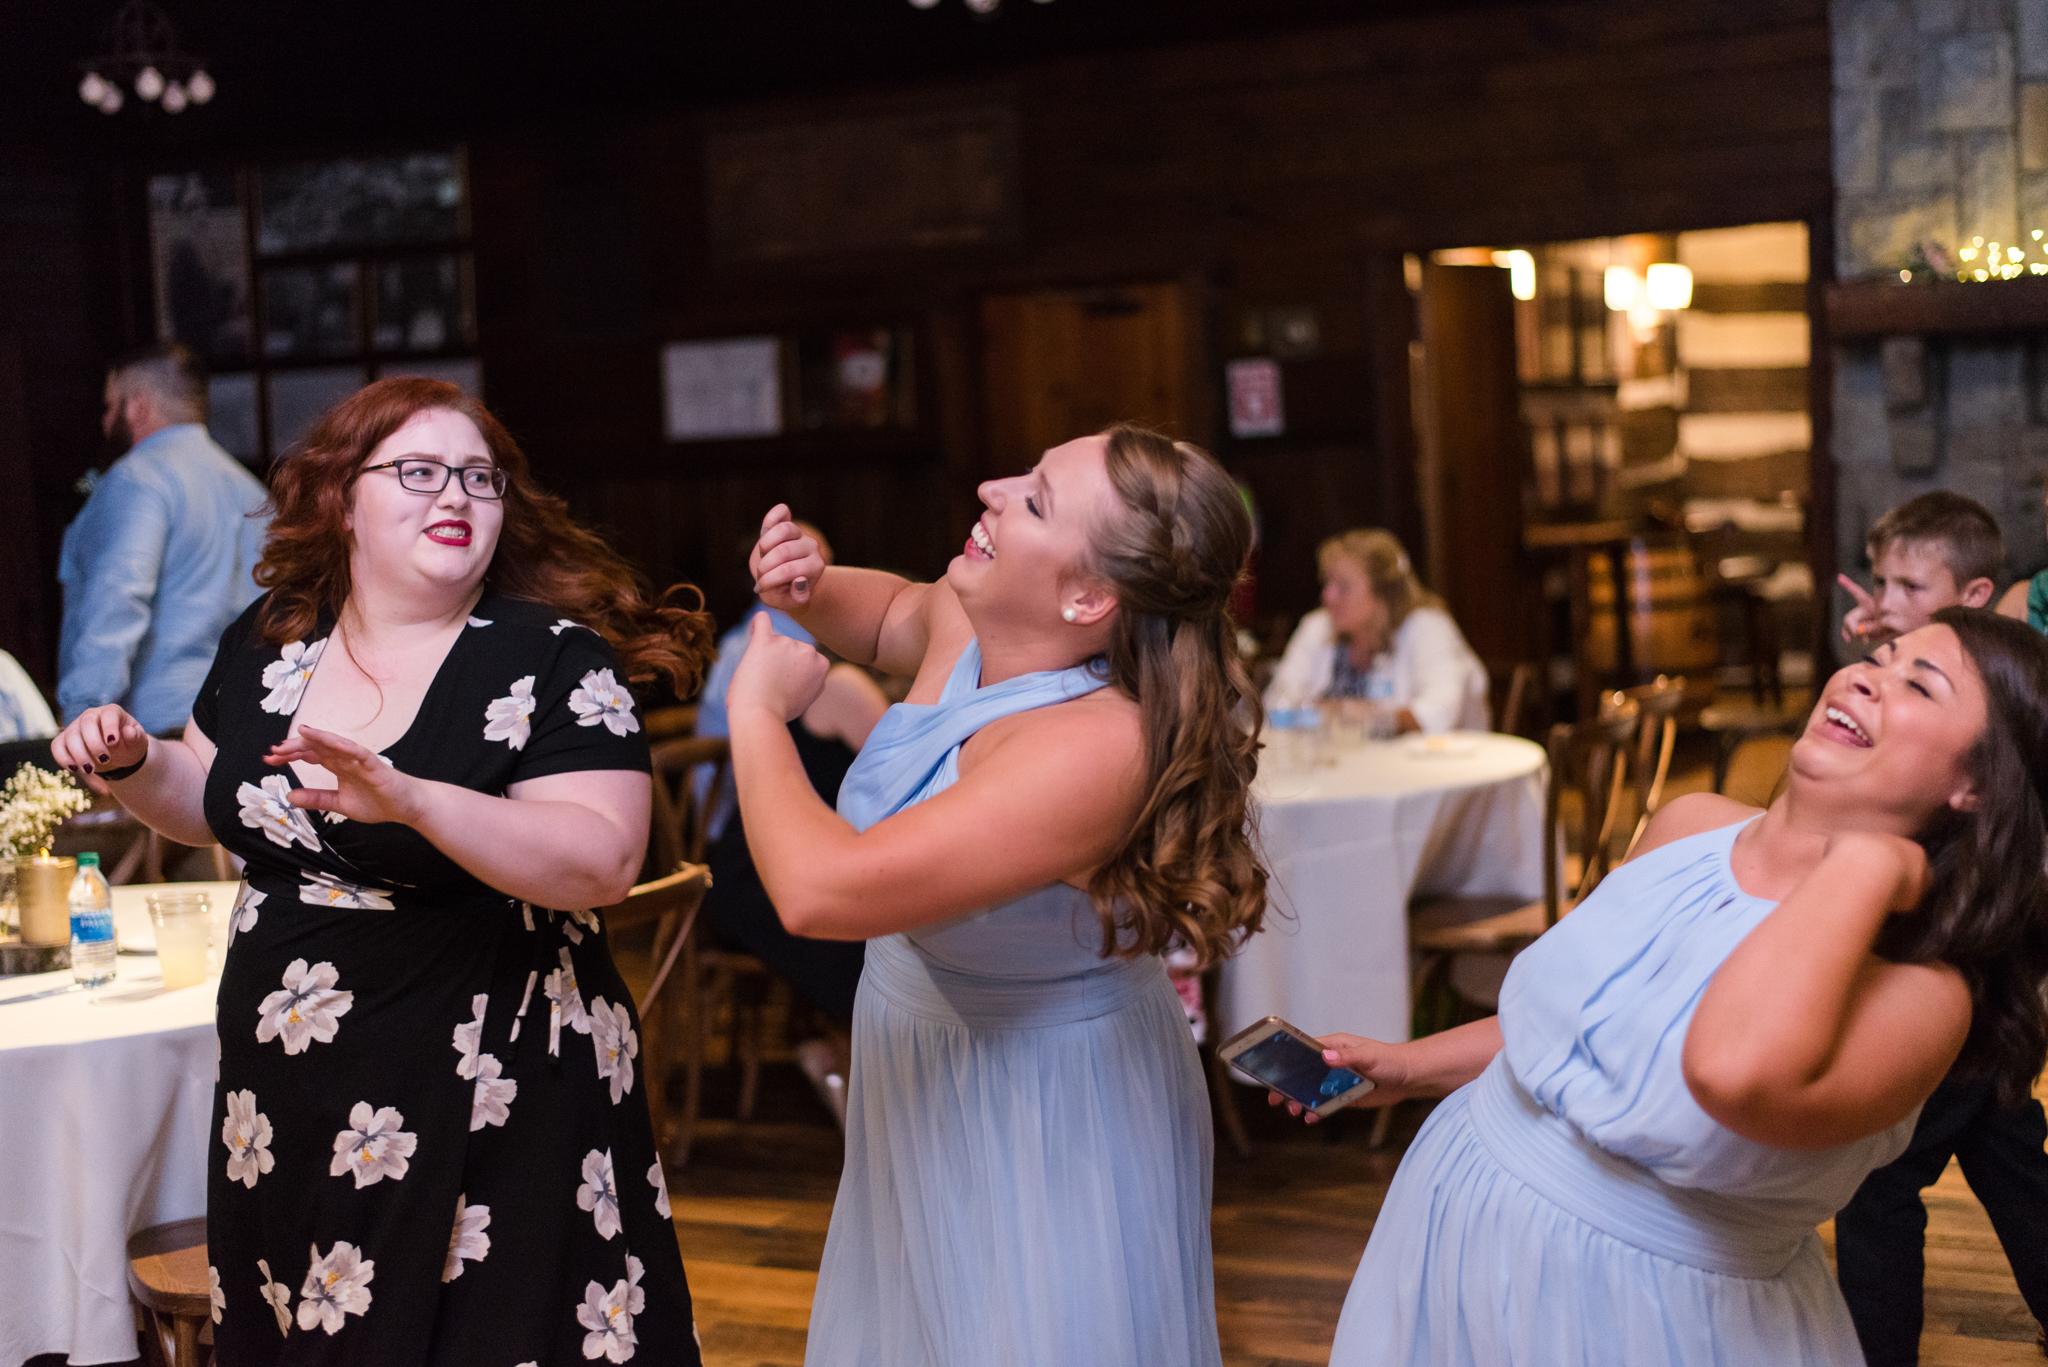 dancing at a Kentucky wedding